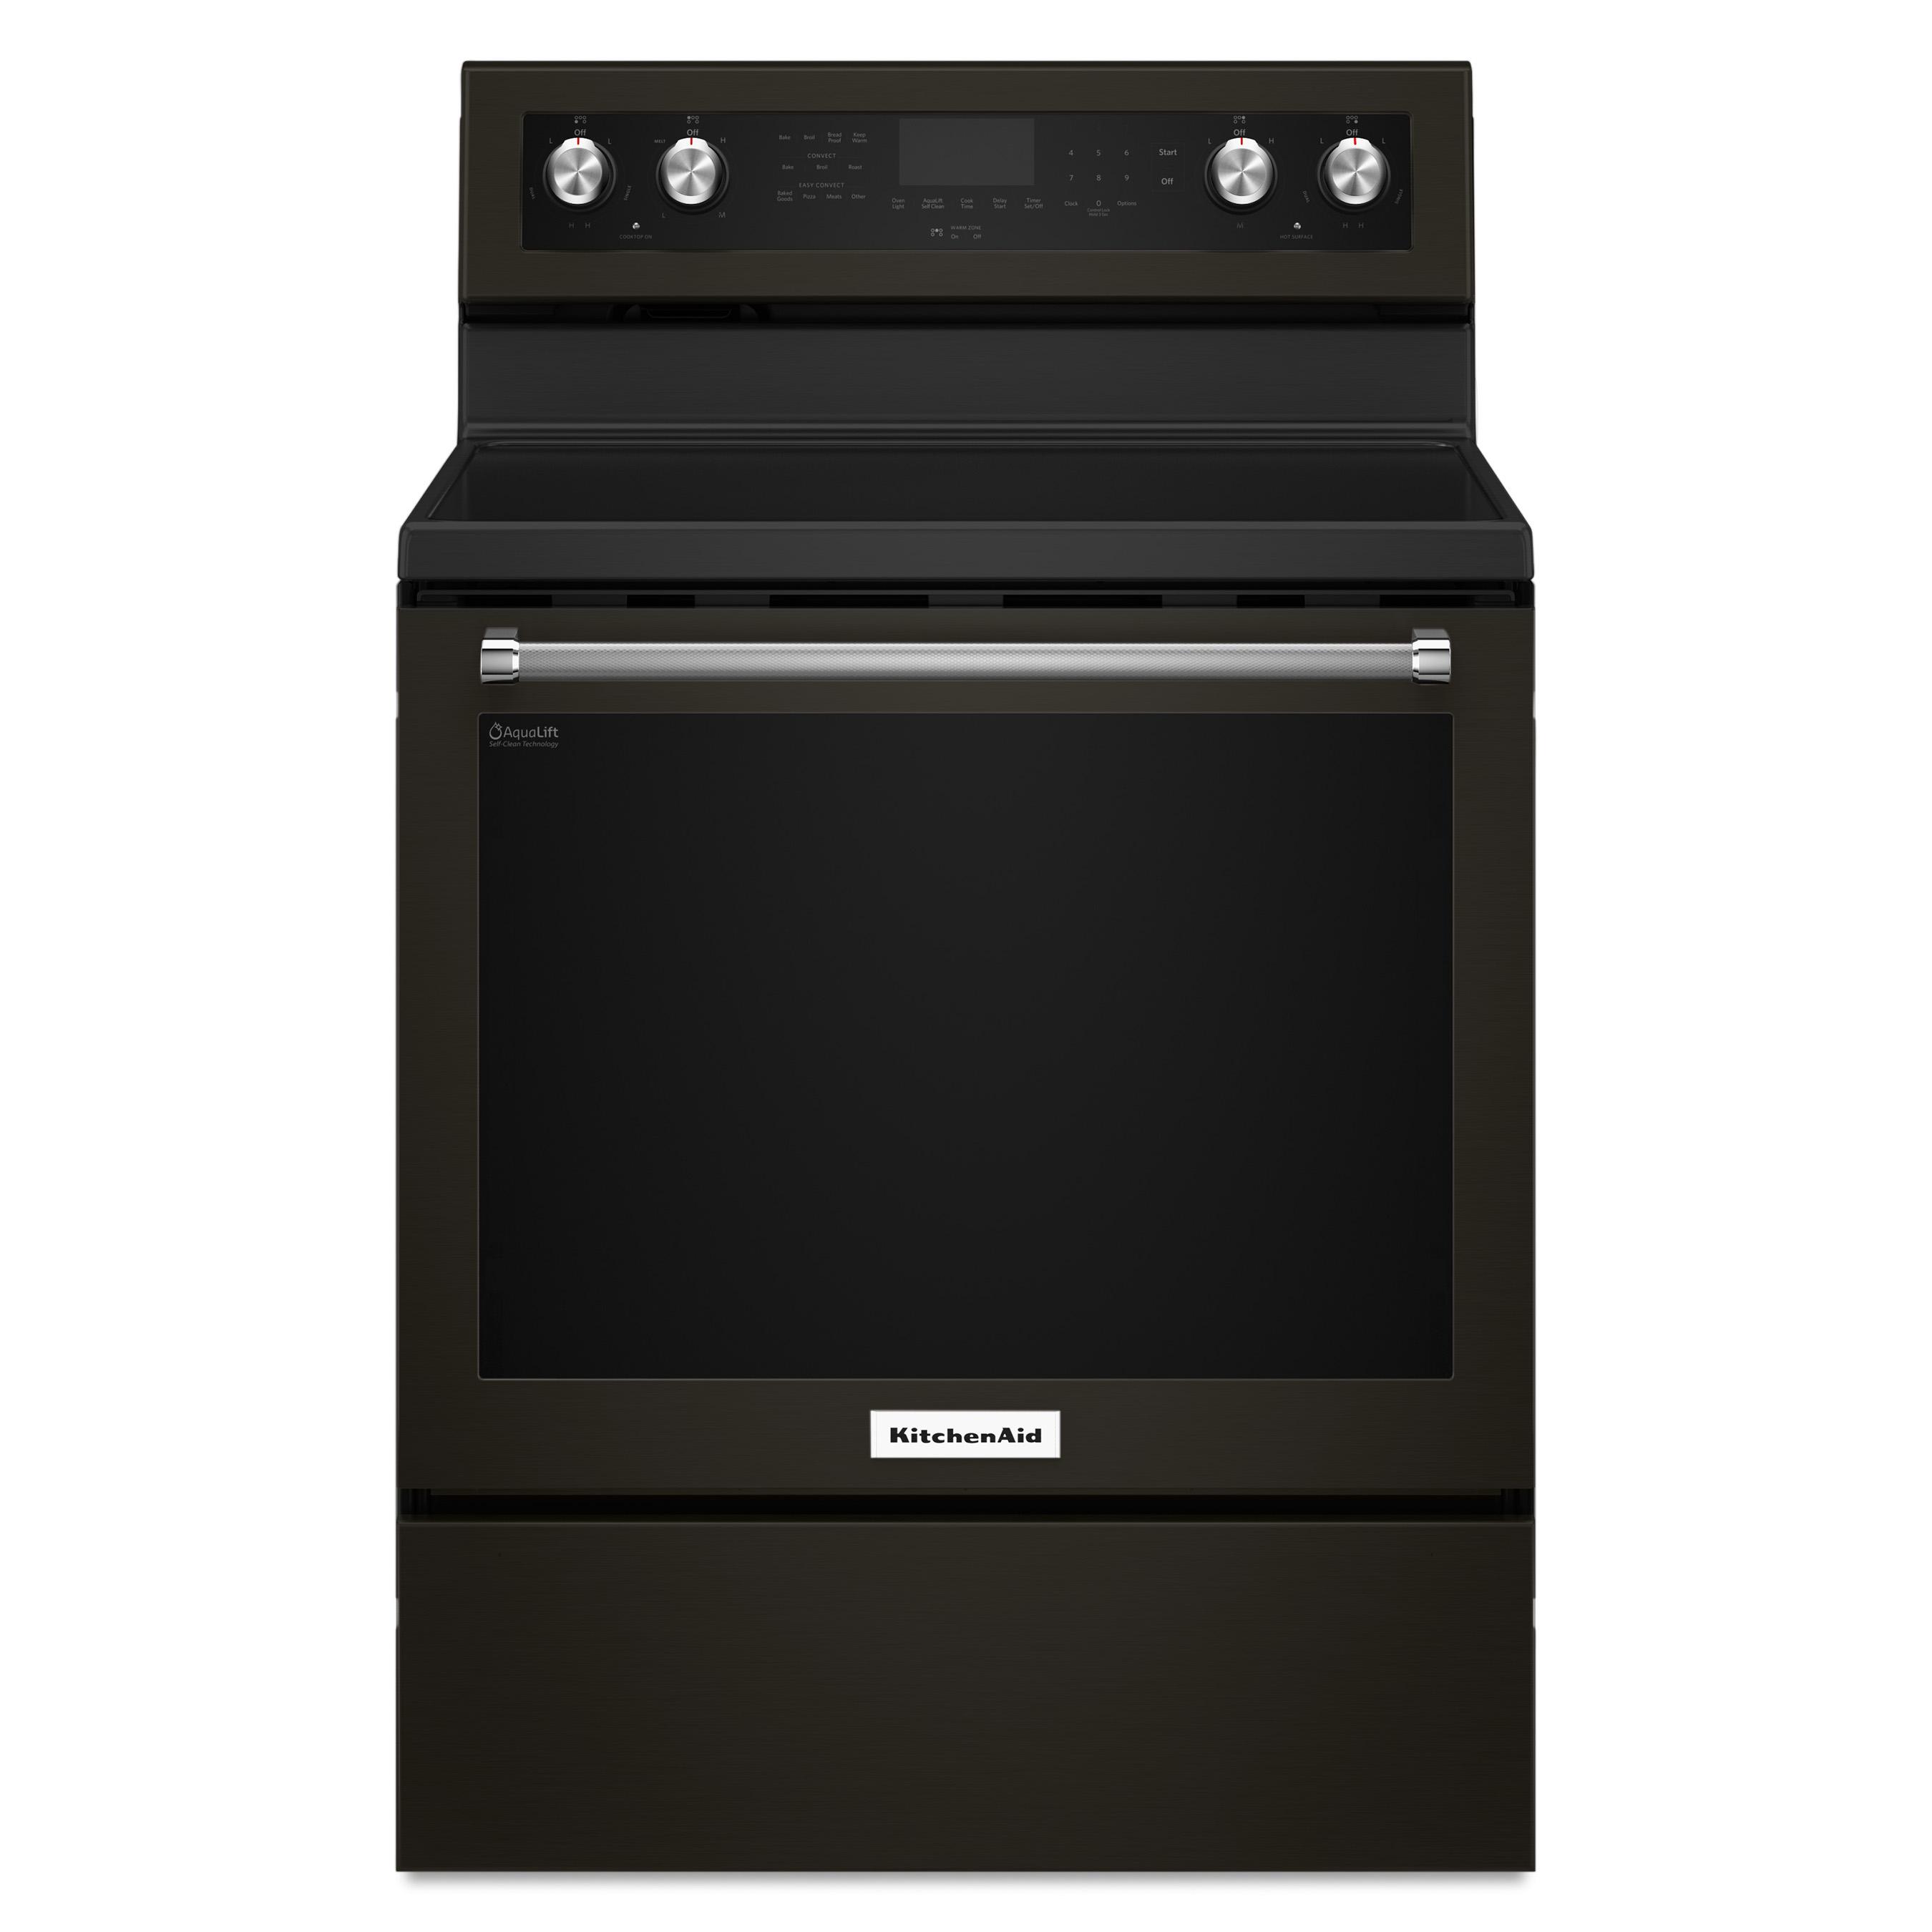 kitchen aid appliances white set kitchenaid expands black stainless collection of major